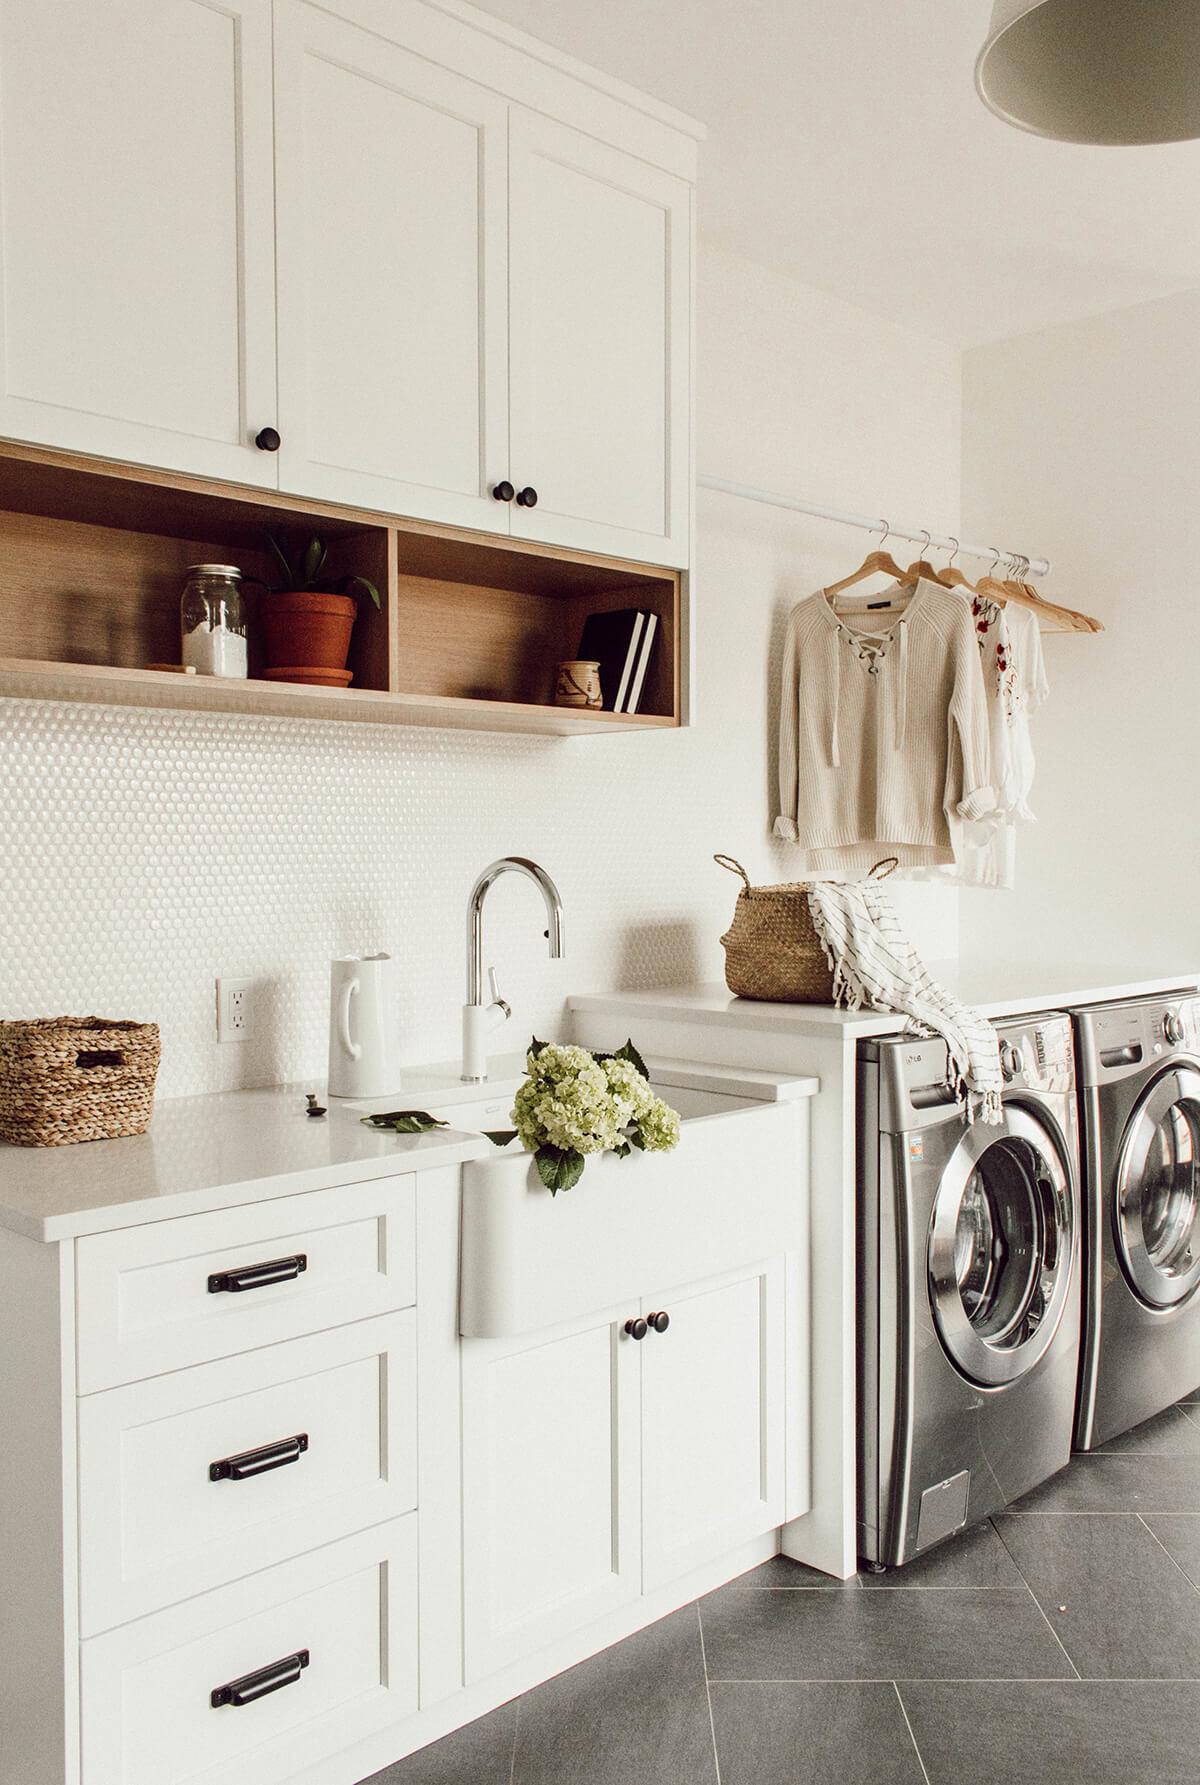 Laundry Room Penny Tile Backsplash